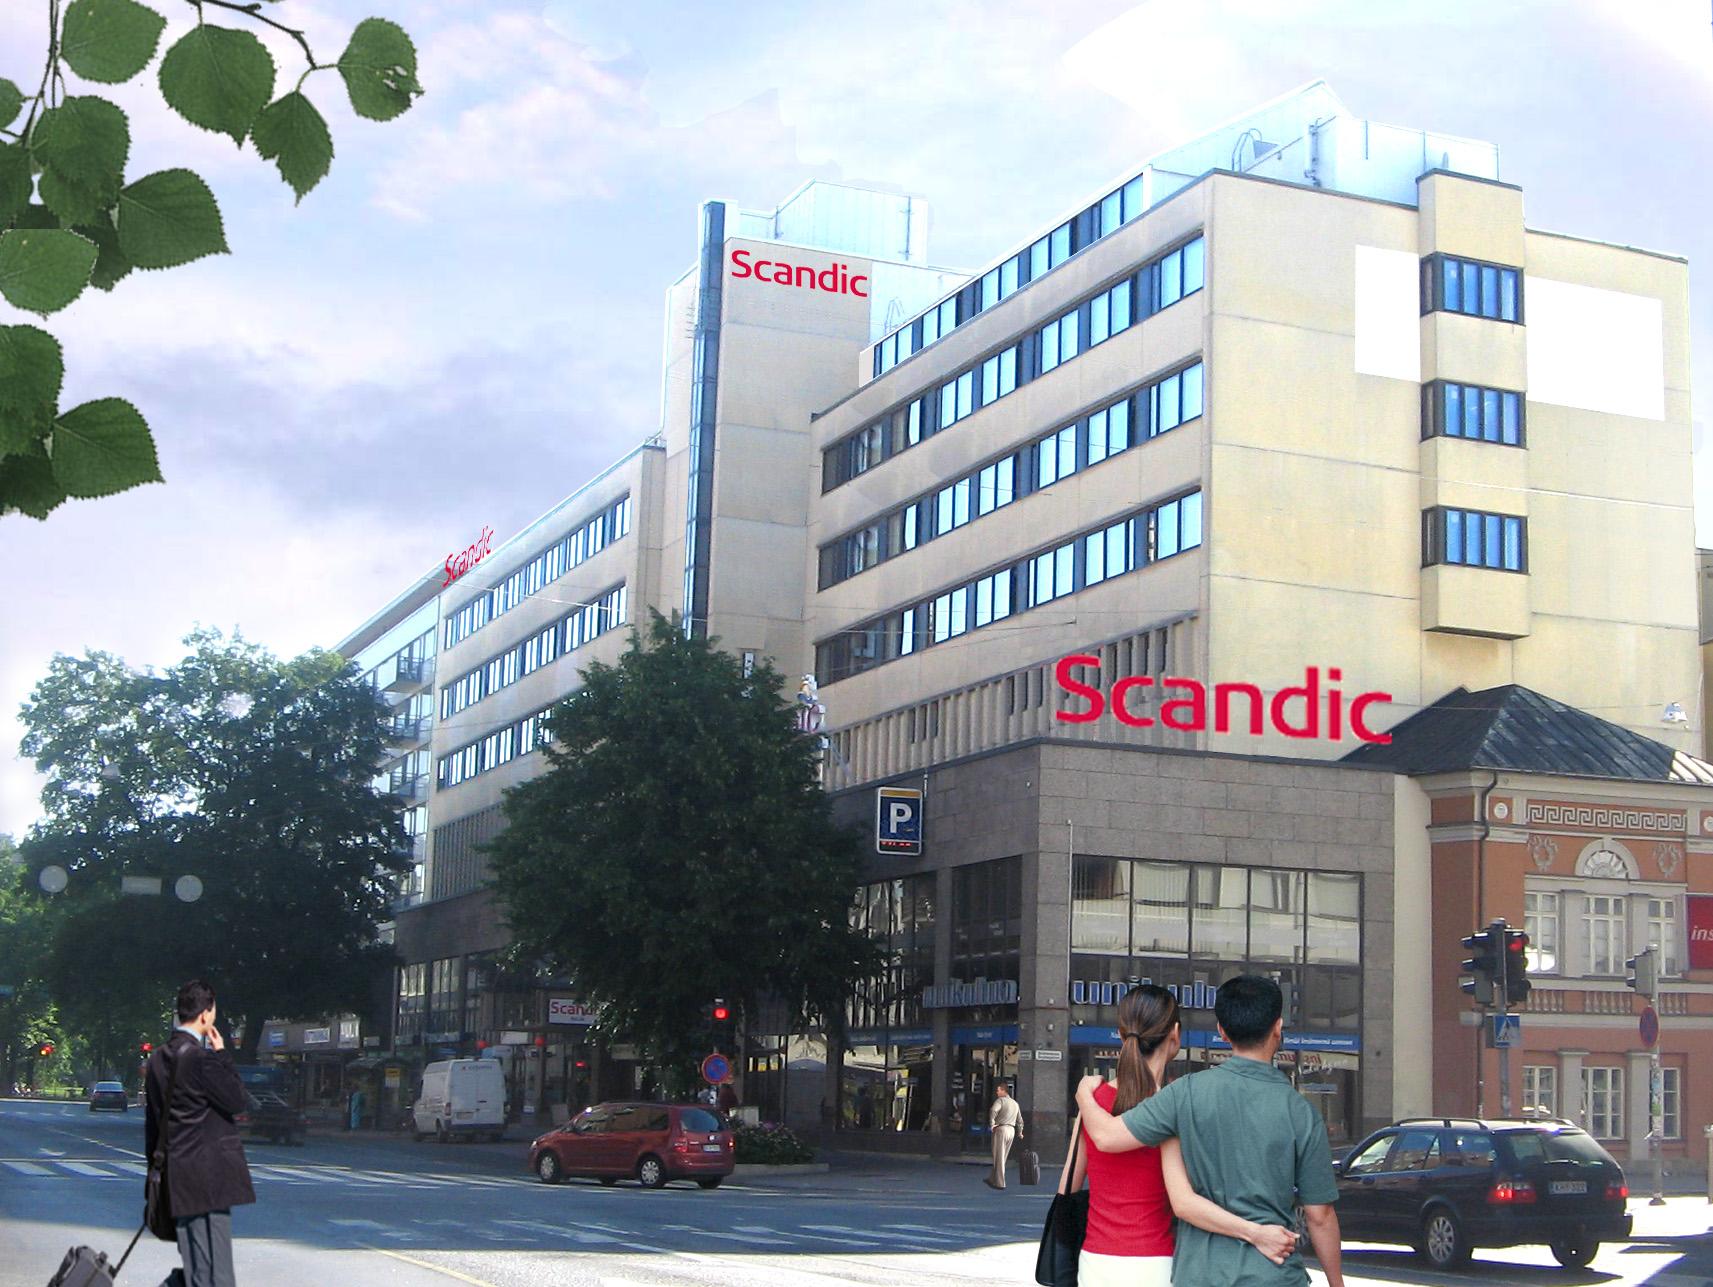 Scandic Julia in Turku, Finland, to be fully renovated